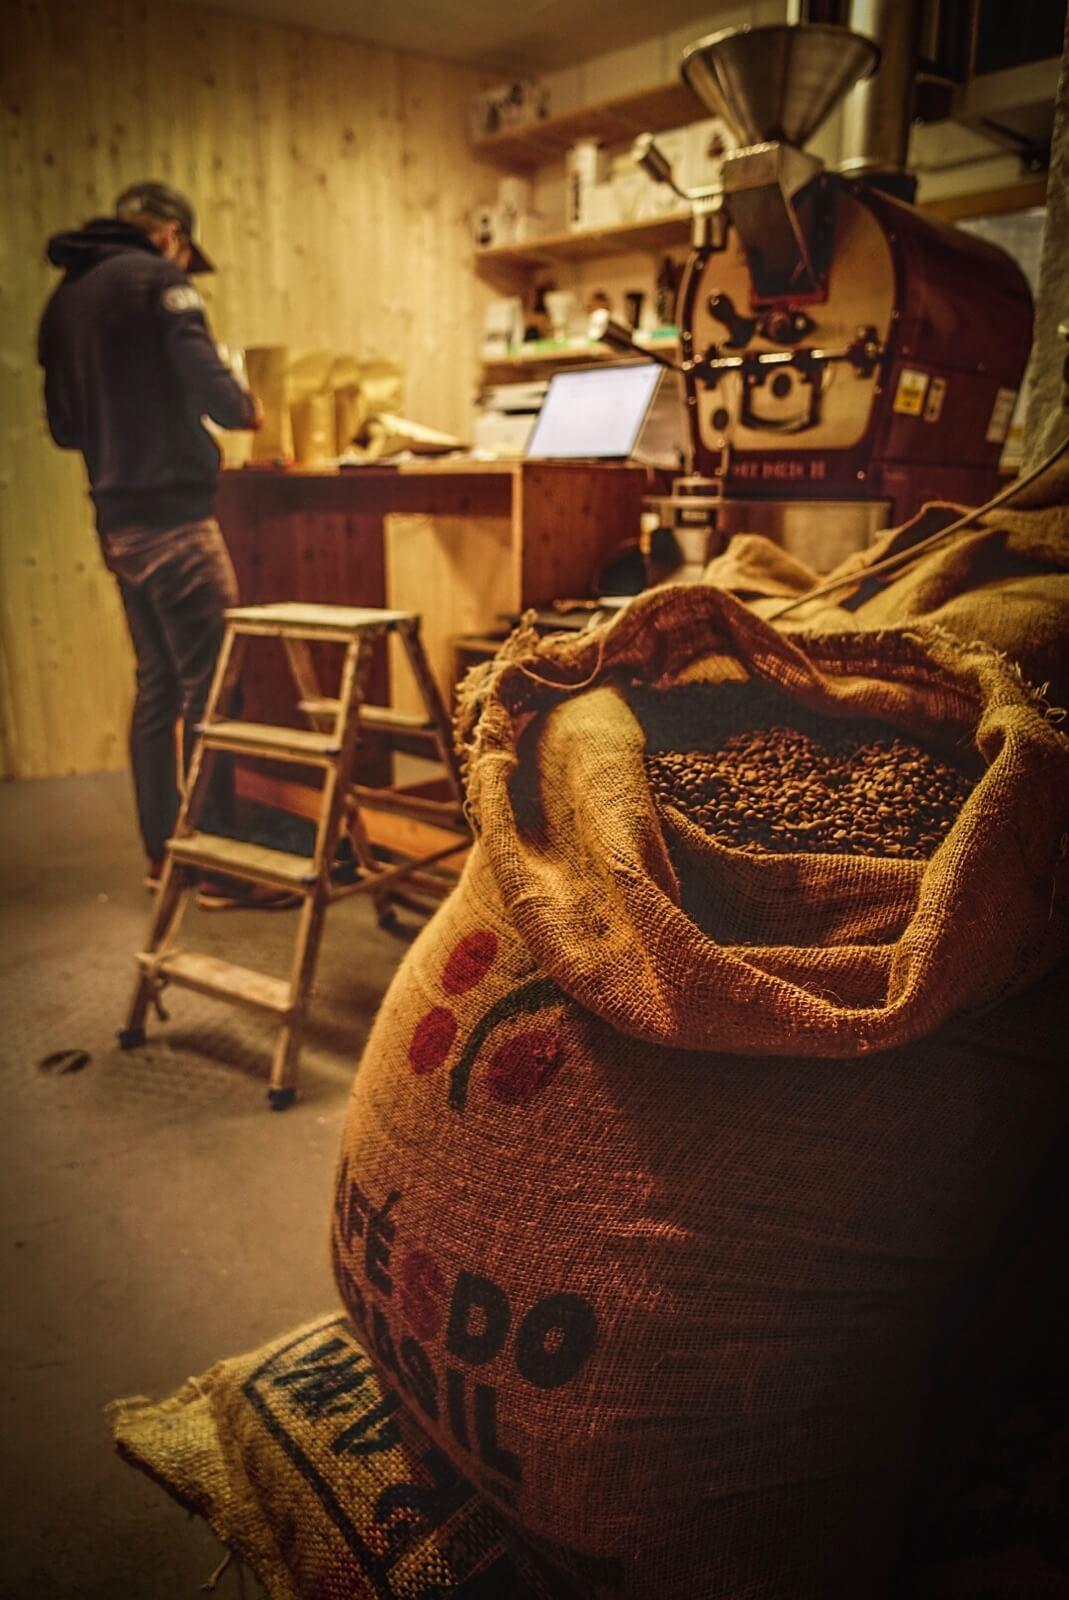 Freshly roasted arabica coffee beans in Zermatt